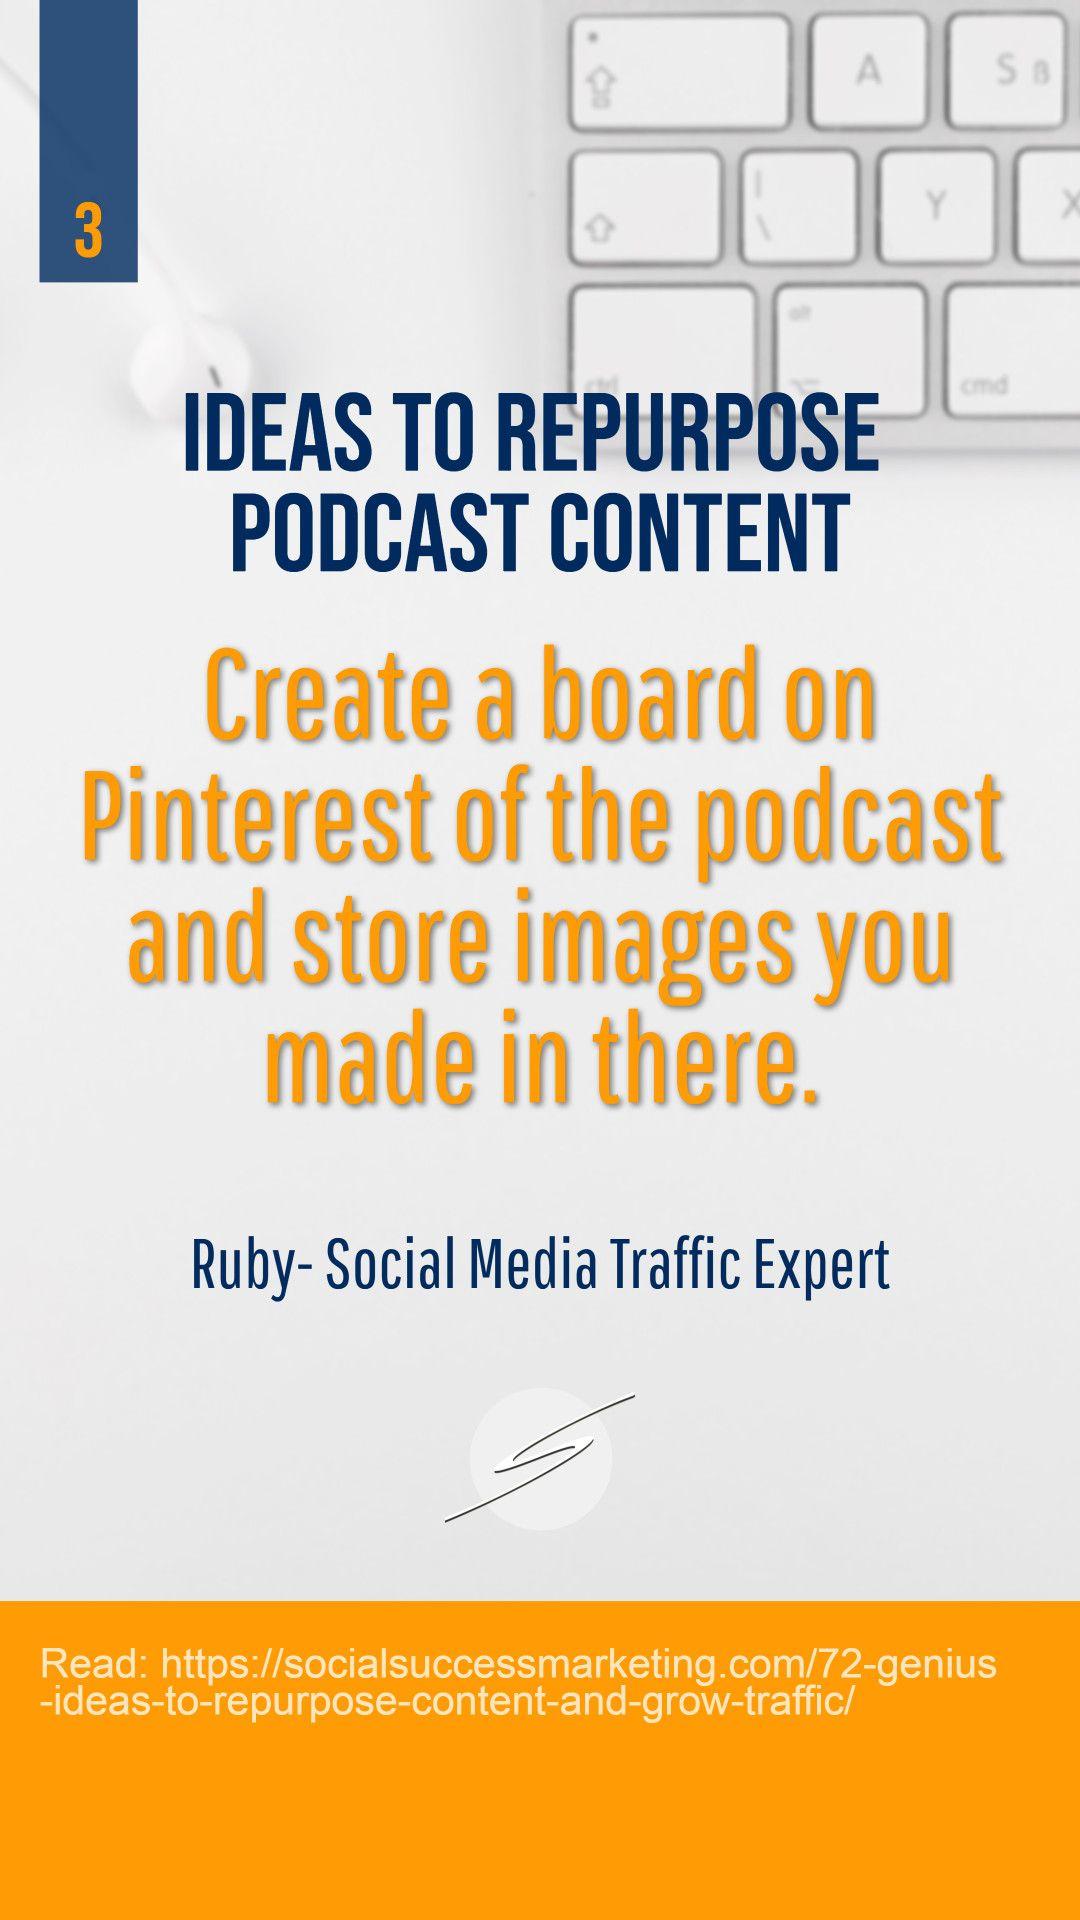 Ideas to repurpose podcast  #podcast #socialmediamarketing #contentmarketing #businessmarketing #startups